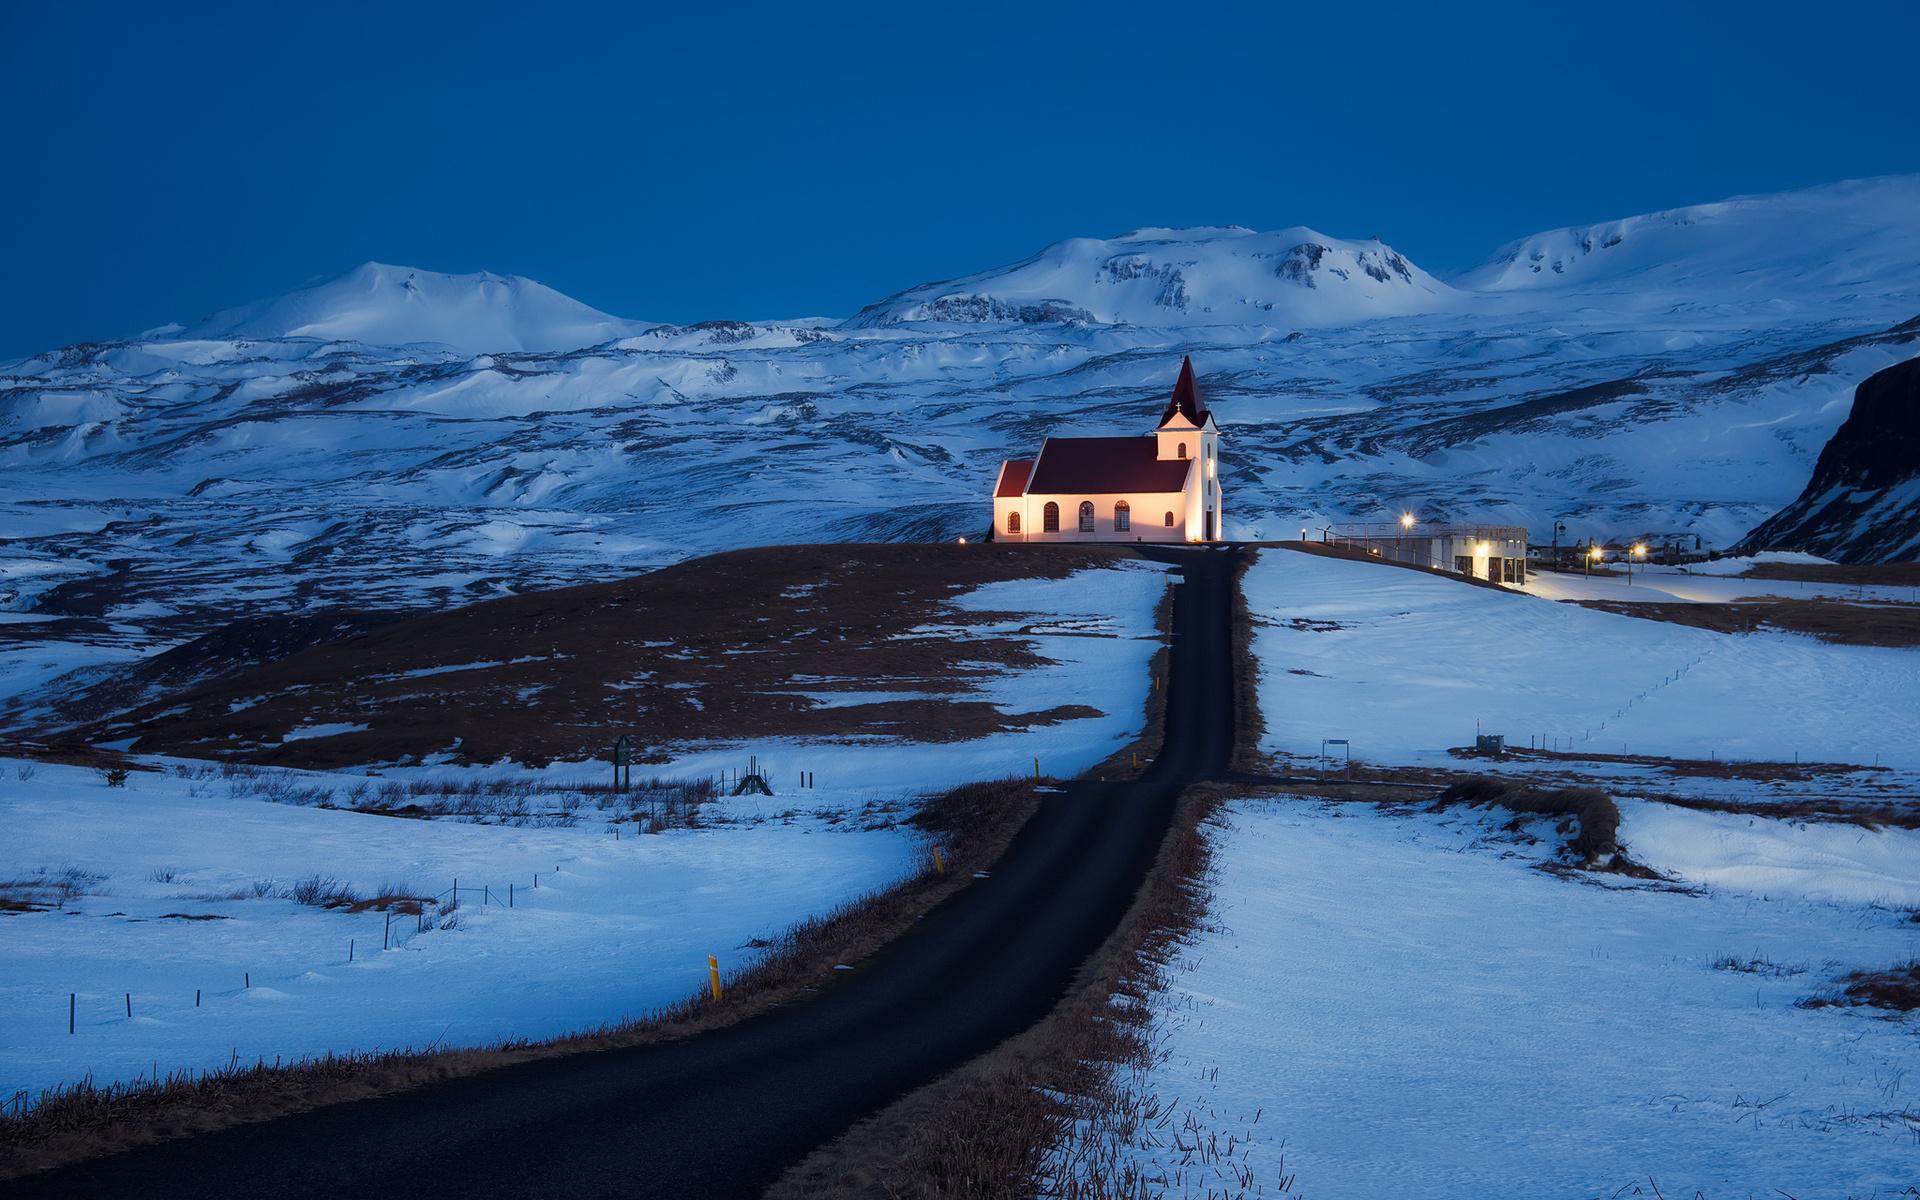 Iceland church light lighting road hills mountains snow blue sky night 1920x1200